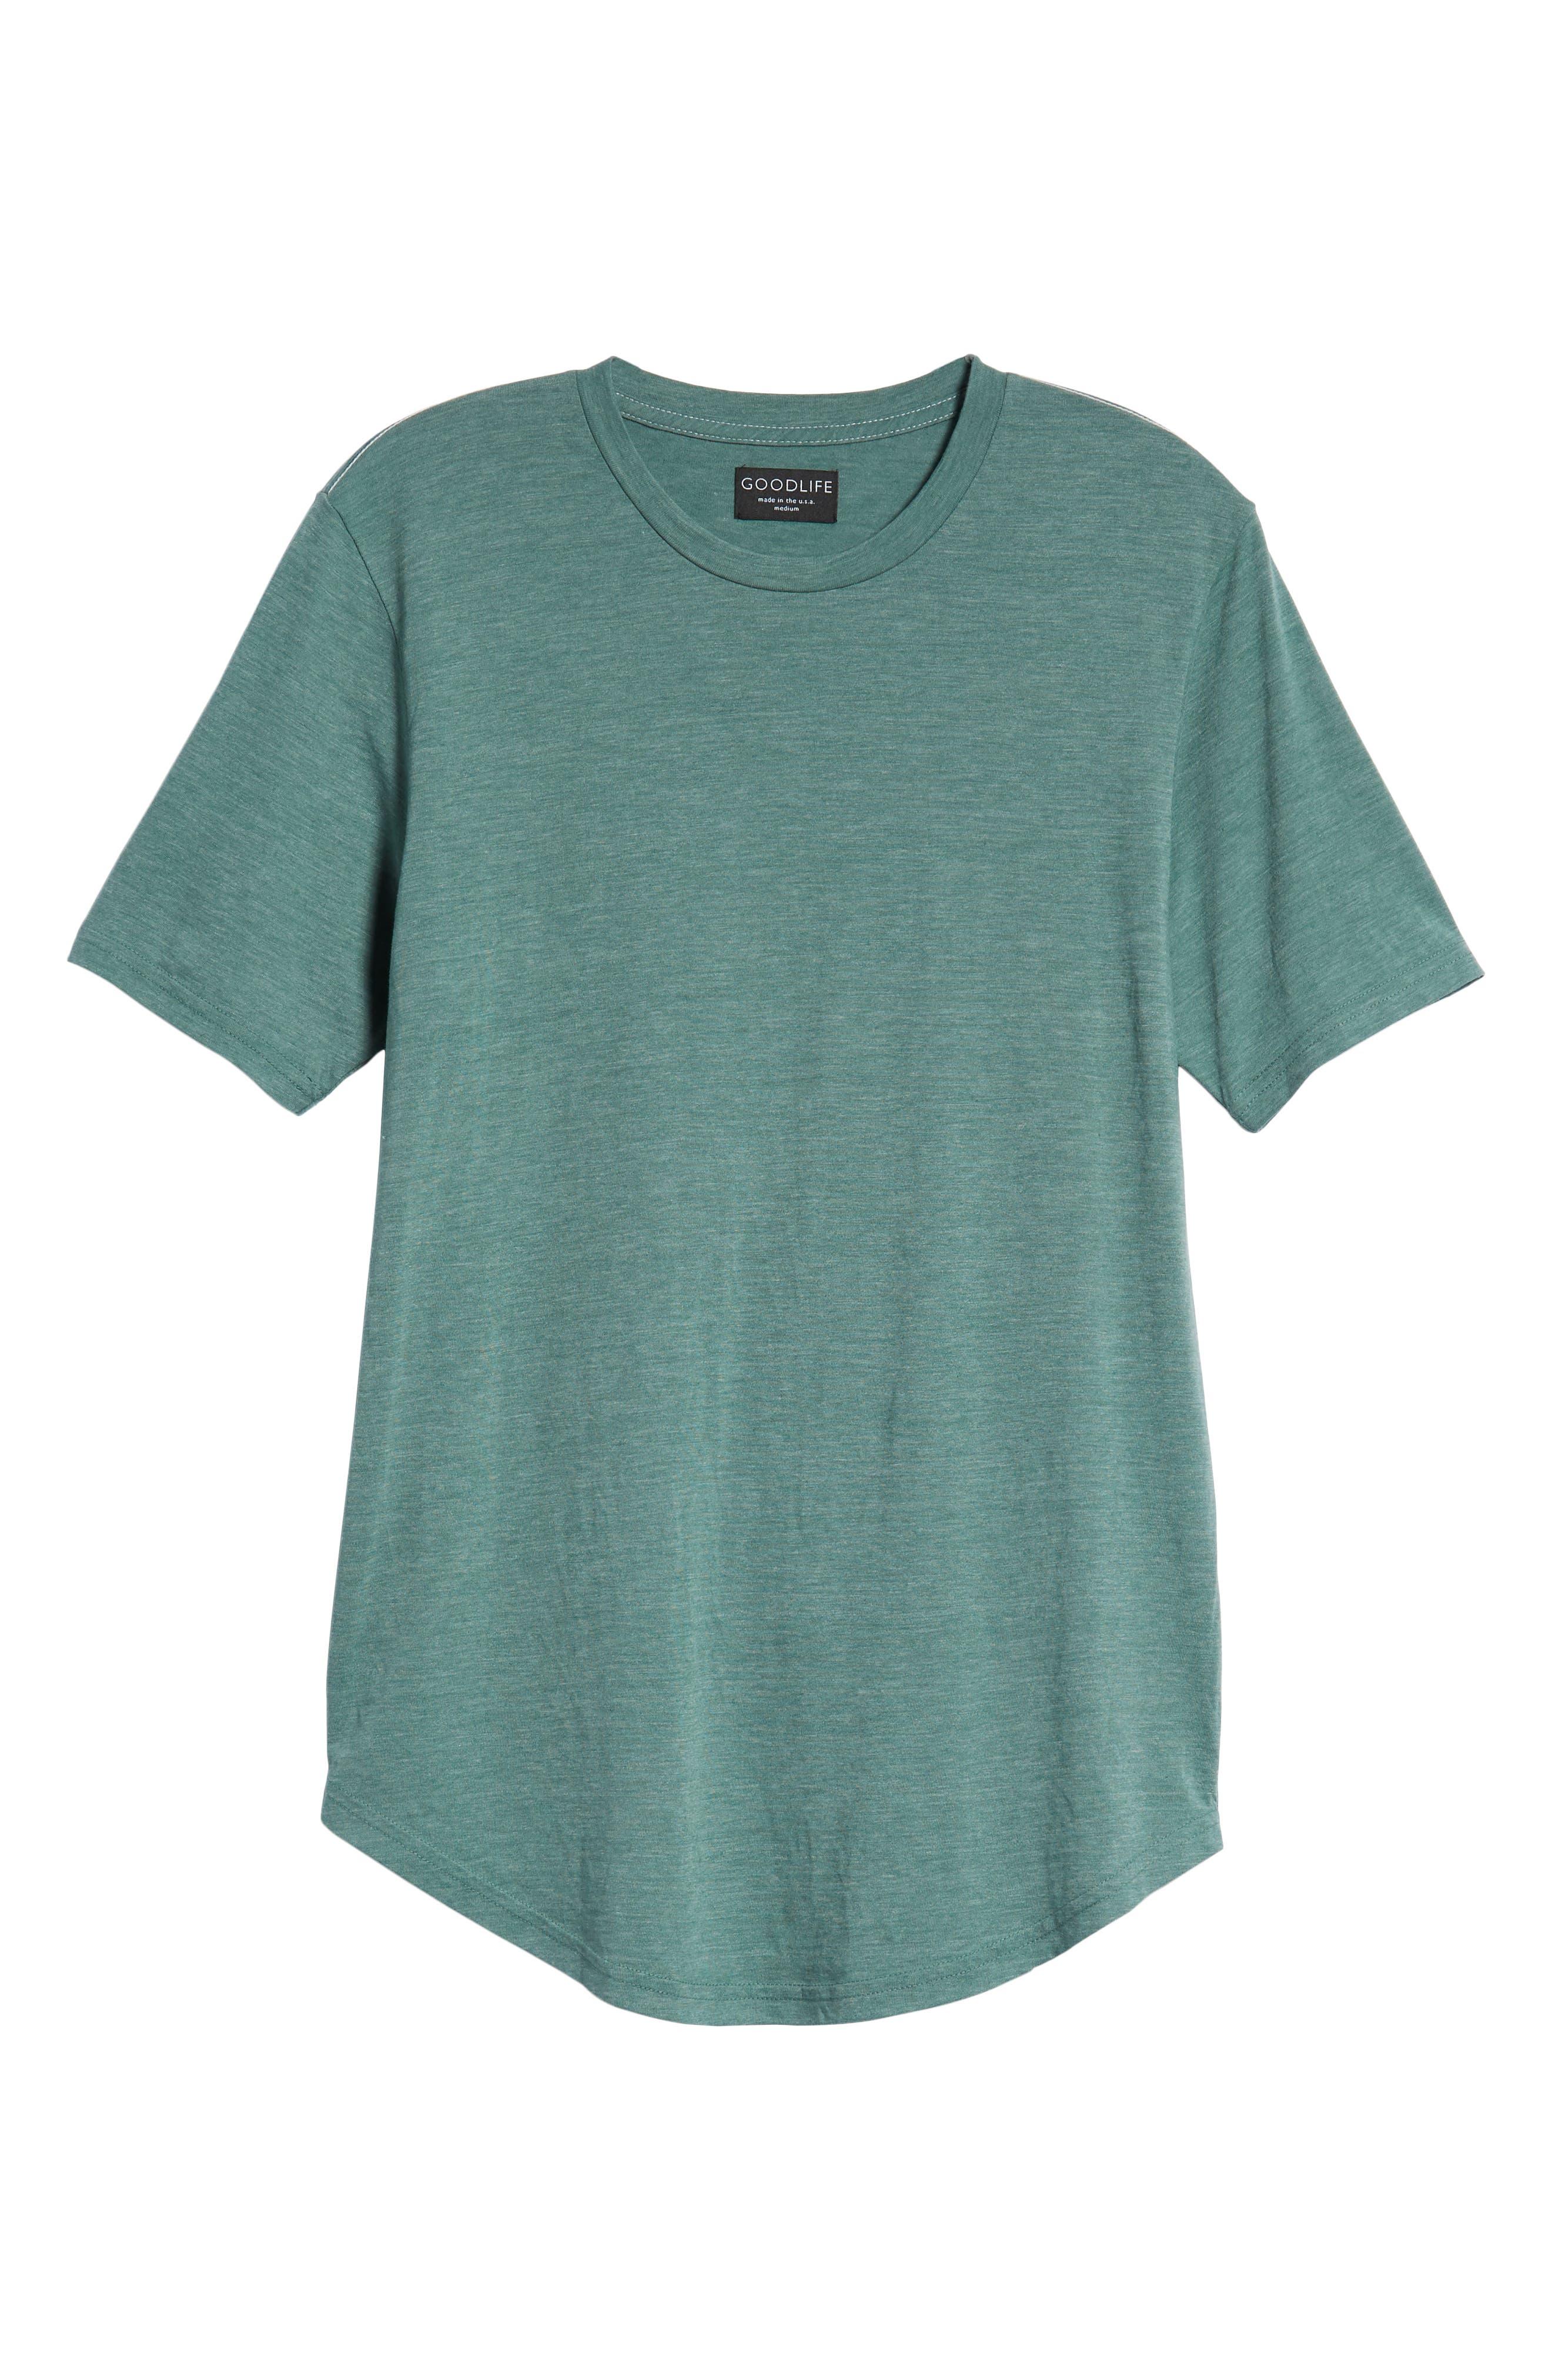 Scallop Triblend Crewneck T-Shirt,                             Alternate thumbnail 6, color,                             PINE